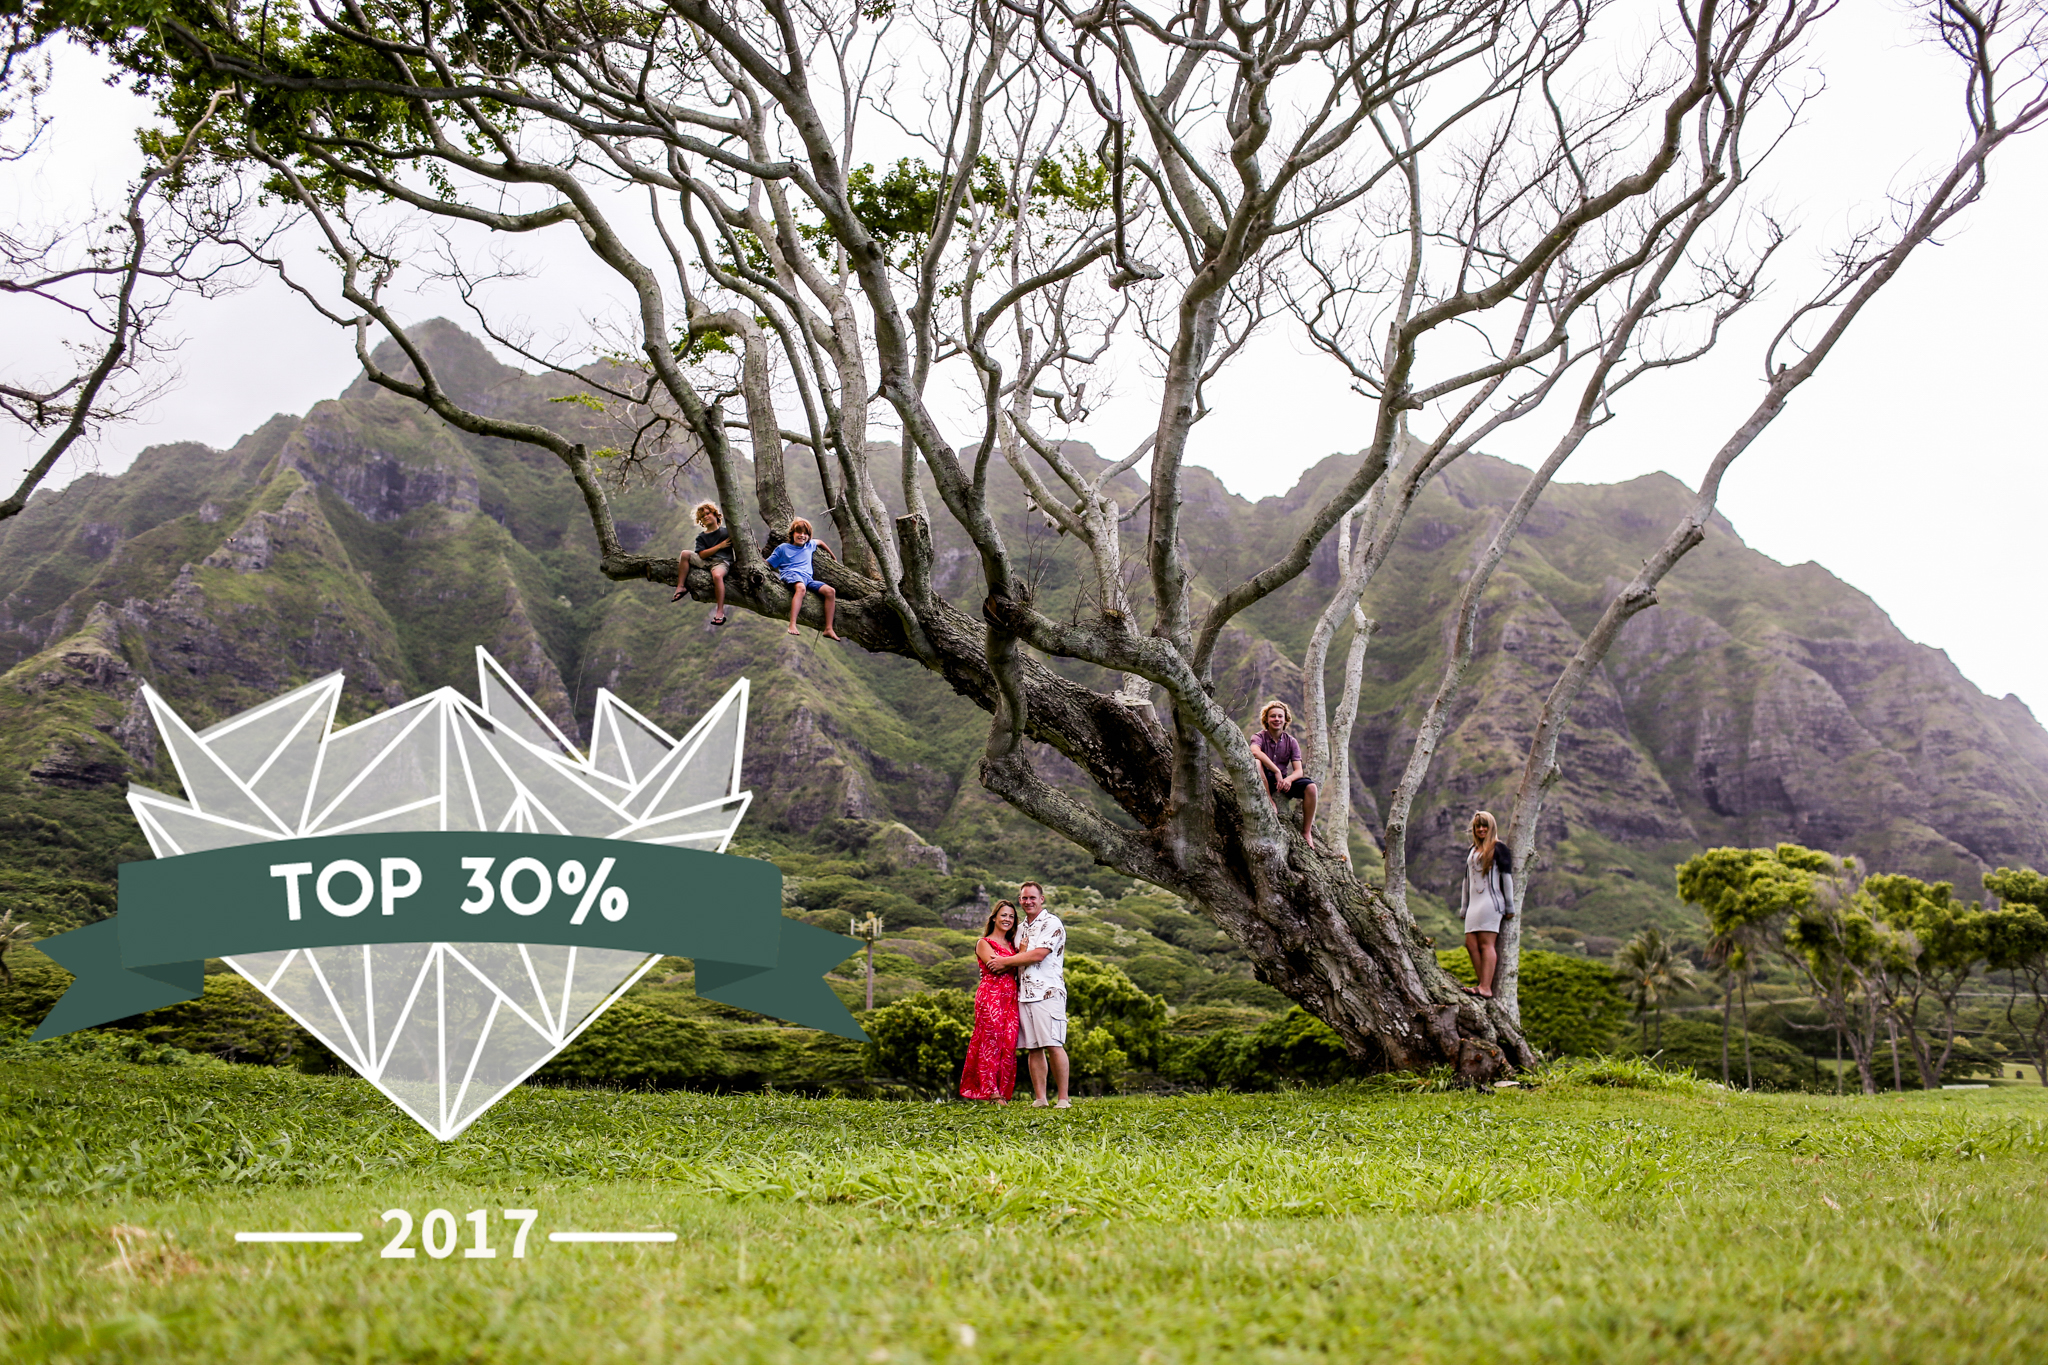 non watermarked 2017 shoot and share photo awards aloha sunshine photography 20June 15, 2016.jpg